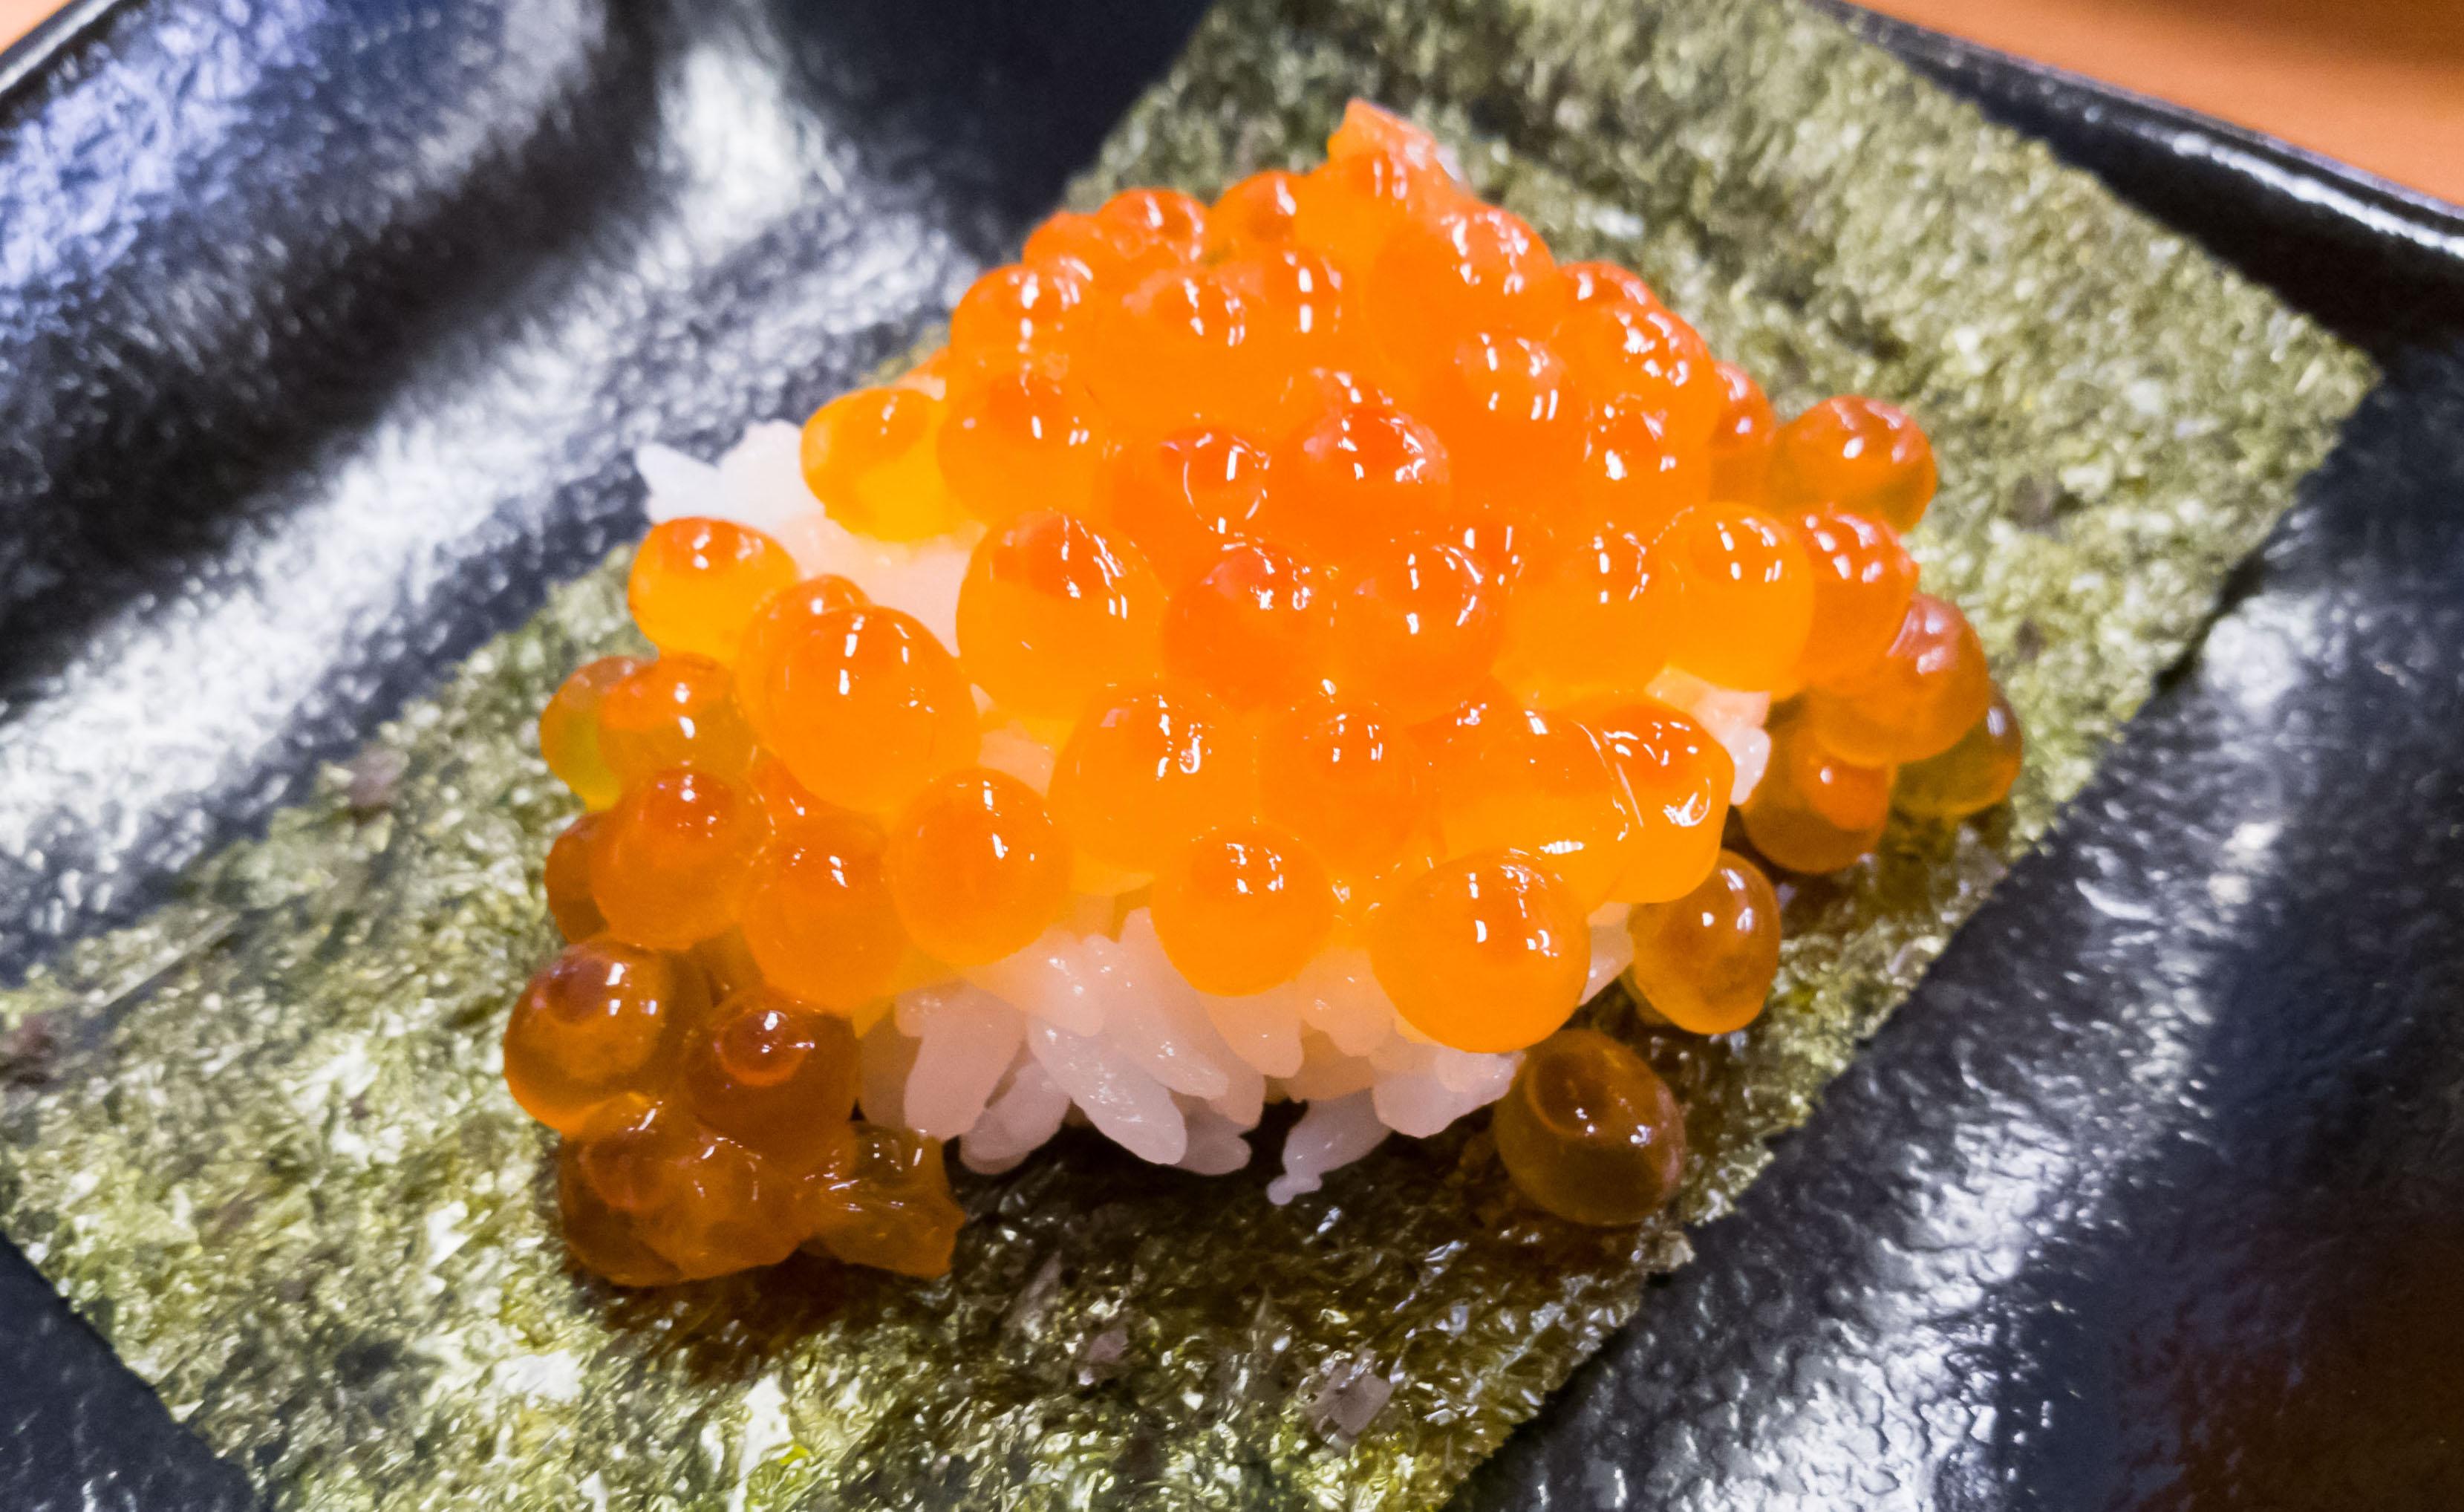 HUAWEI P9でスシローの寿司を撮ってみた